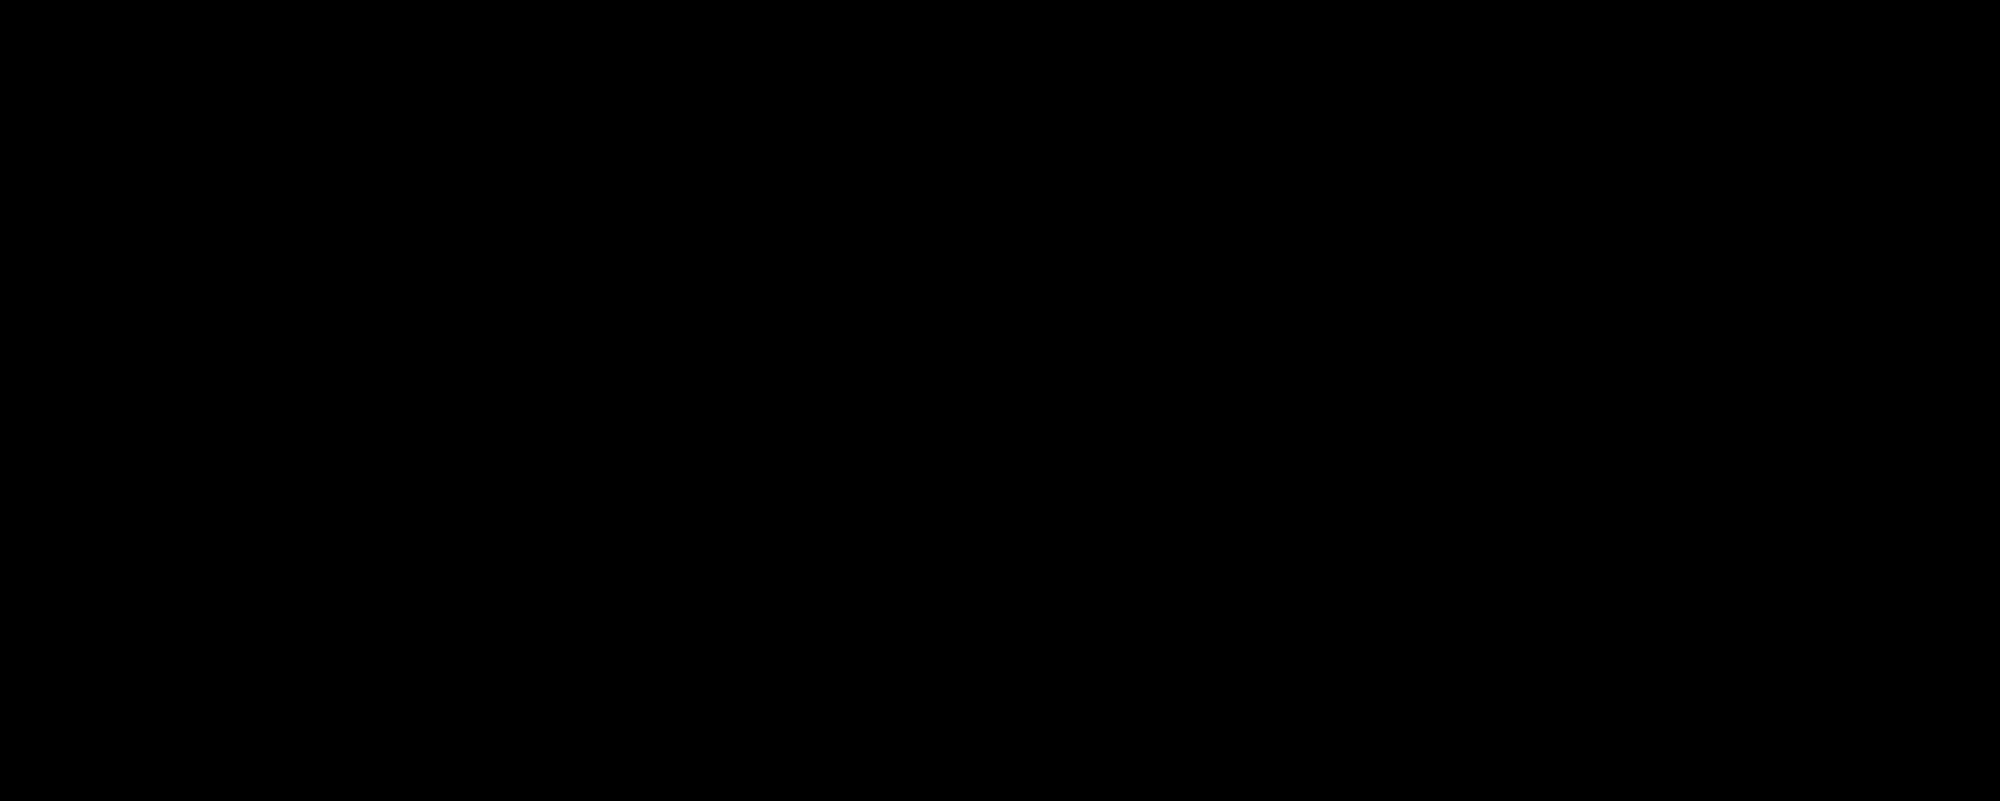 File nynylogo svg wikimedia. Logo clipart hotel